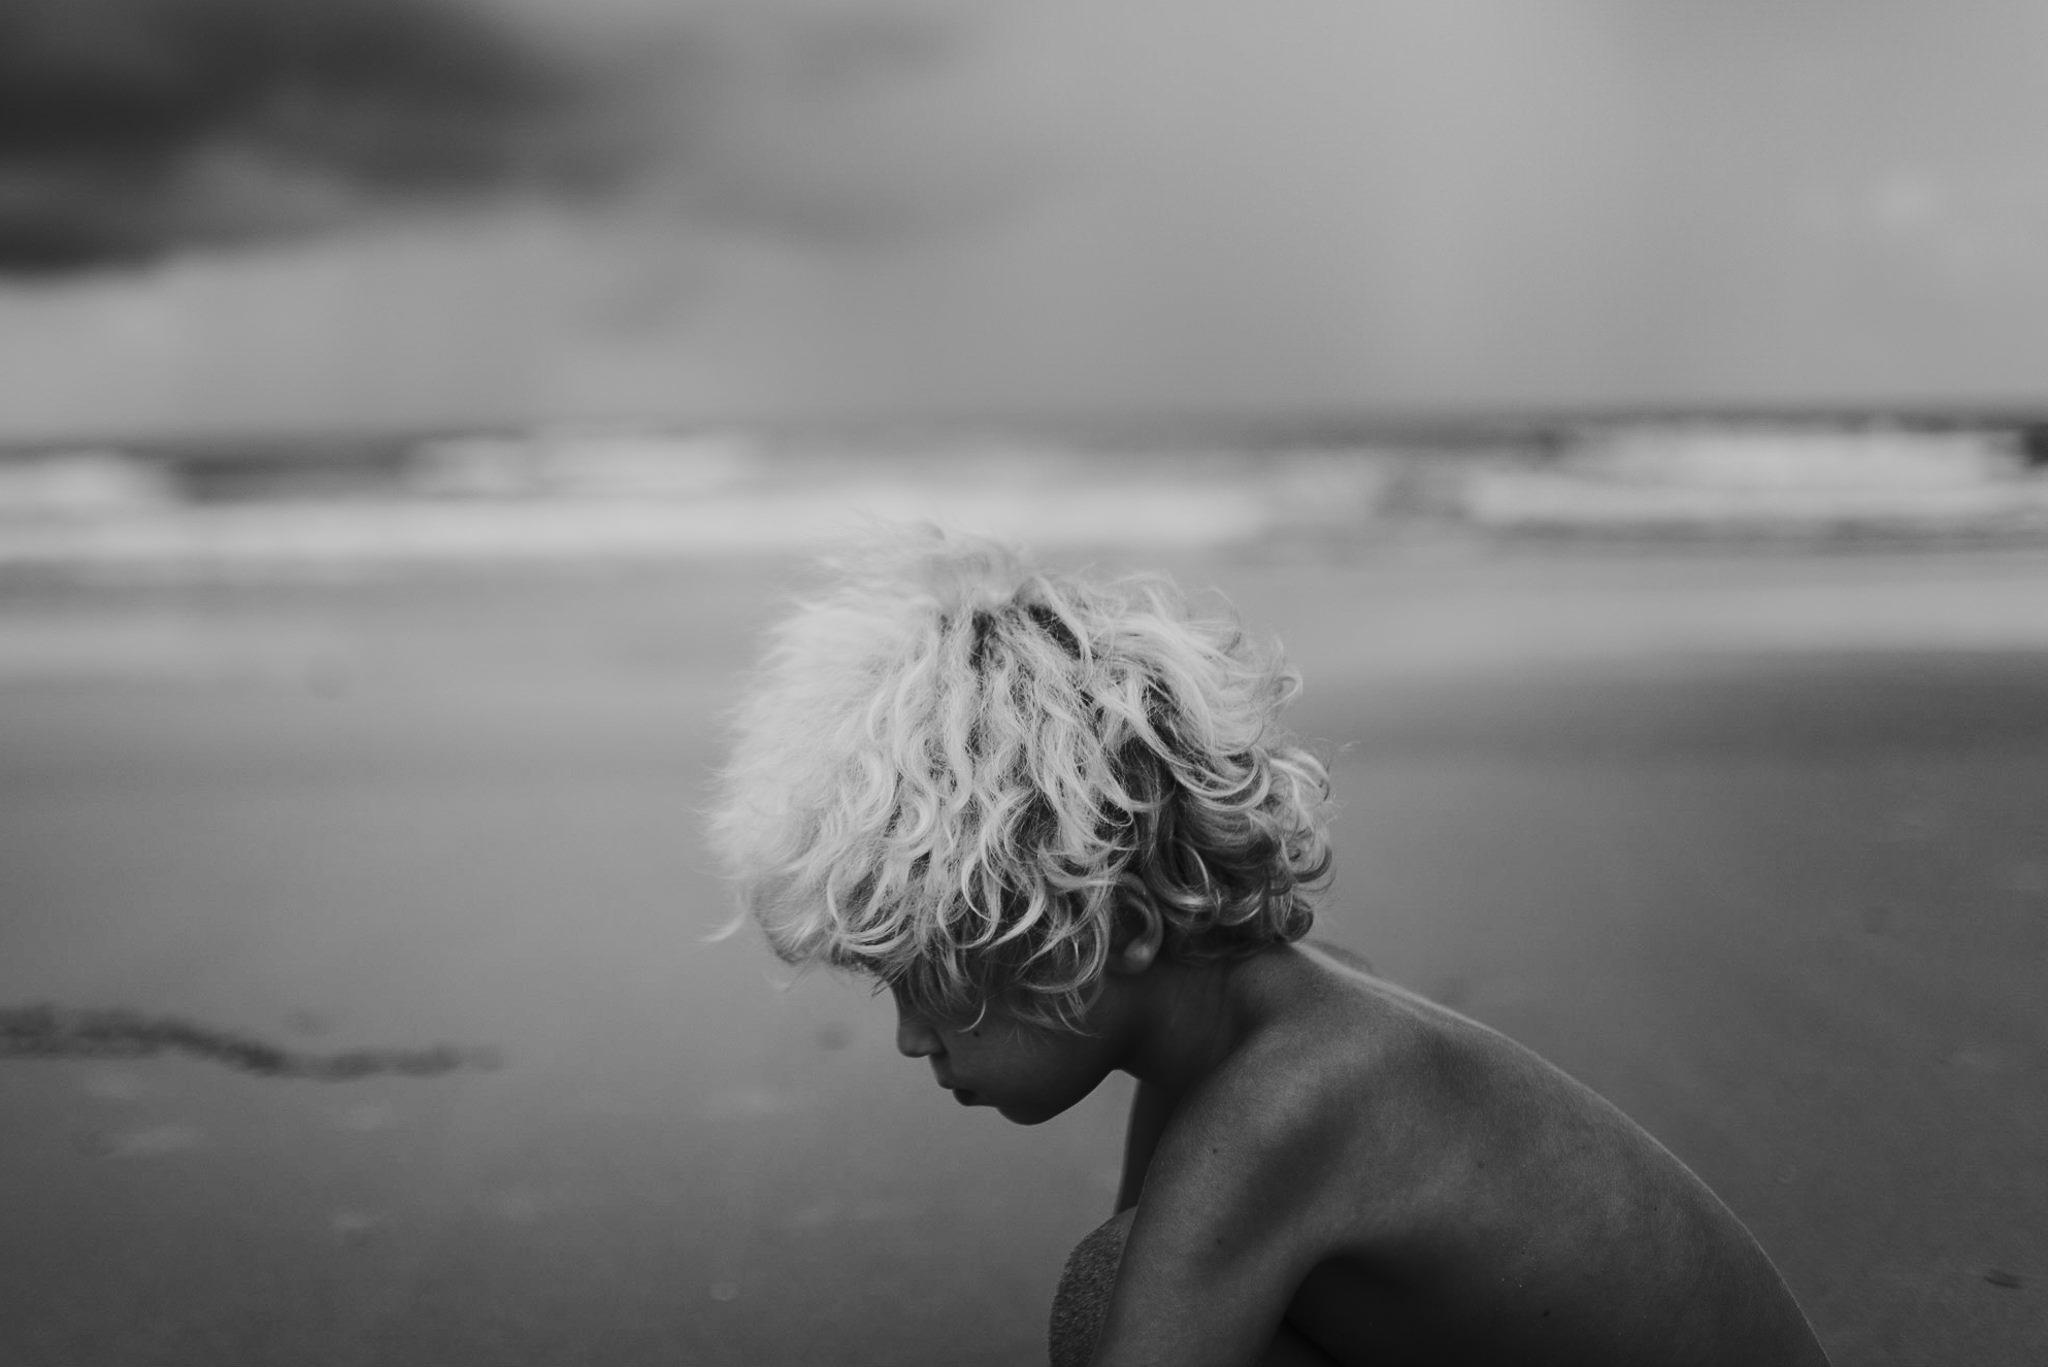 twyla jones photography - treasure coast florida - stormy beach boy playing in sand--27.jpg